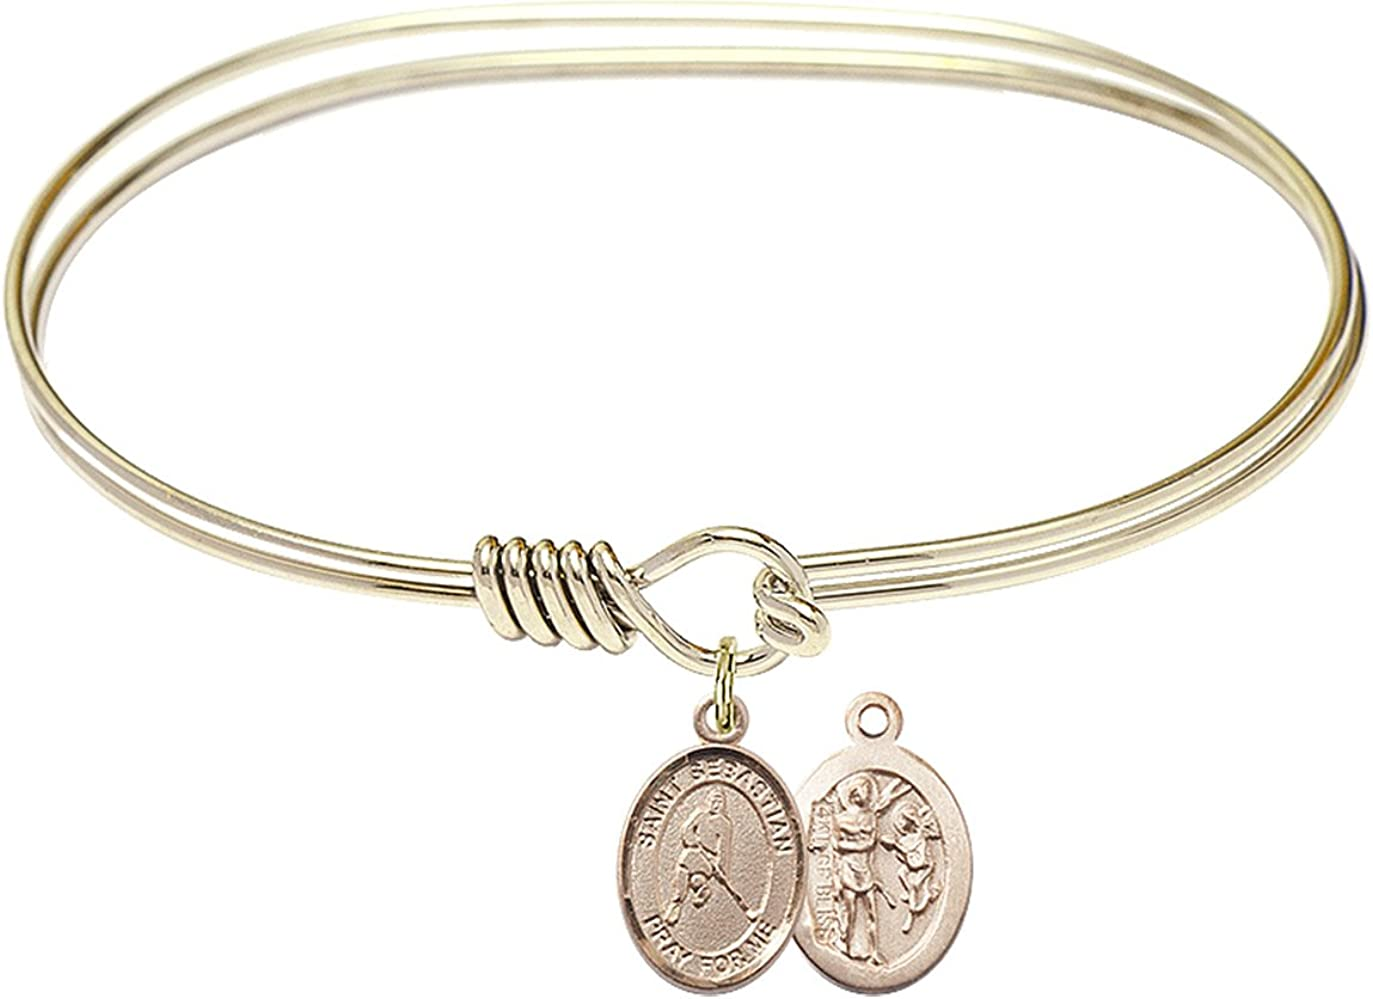 DiamondJewelryNY 40% OFF Cheap Sale Eye Luxury goods Hook Bangle Bracelet St. with a I Sebastian